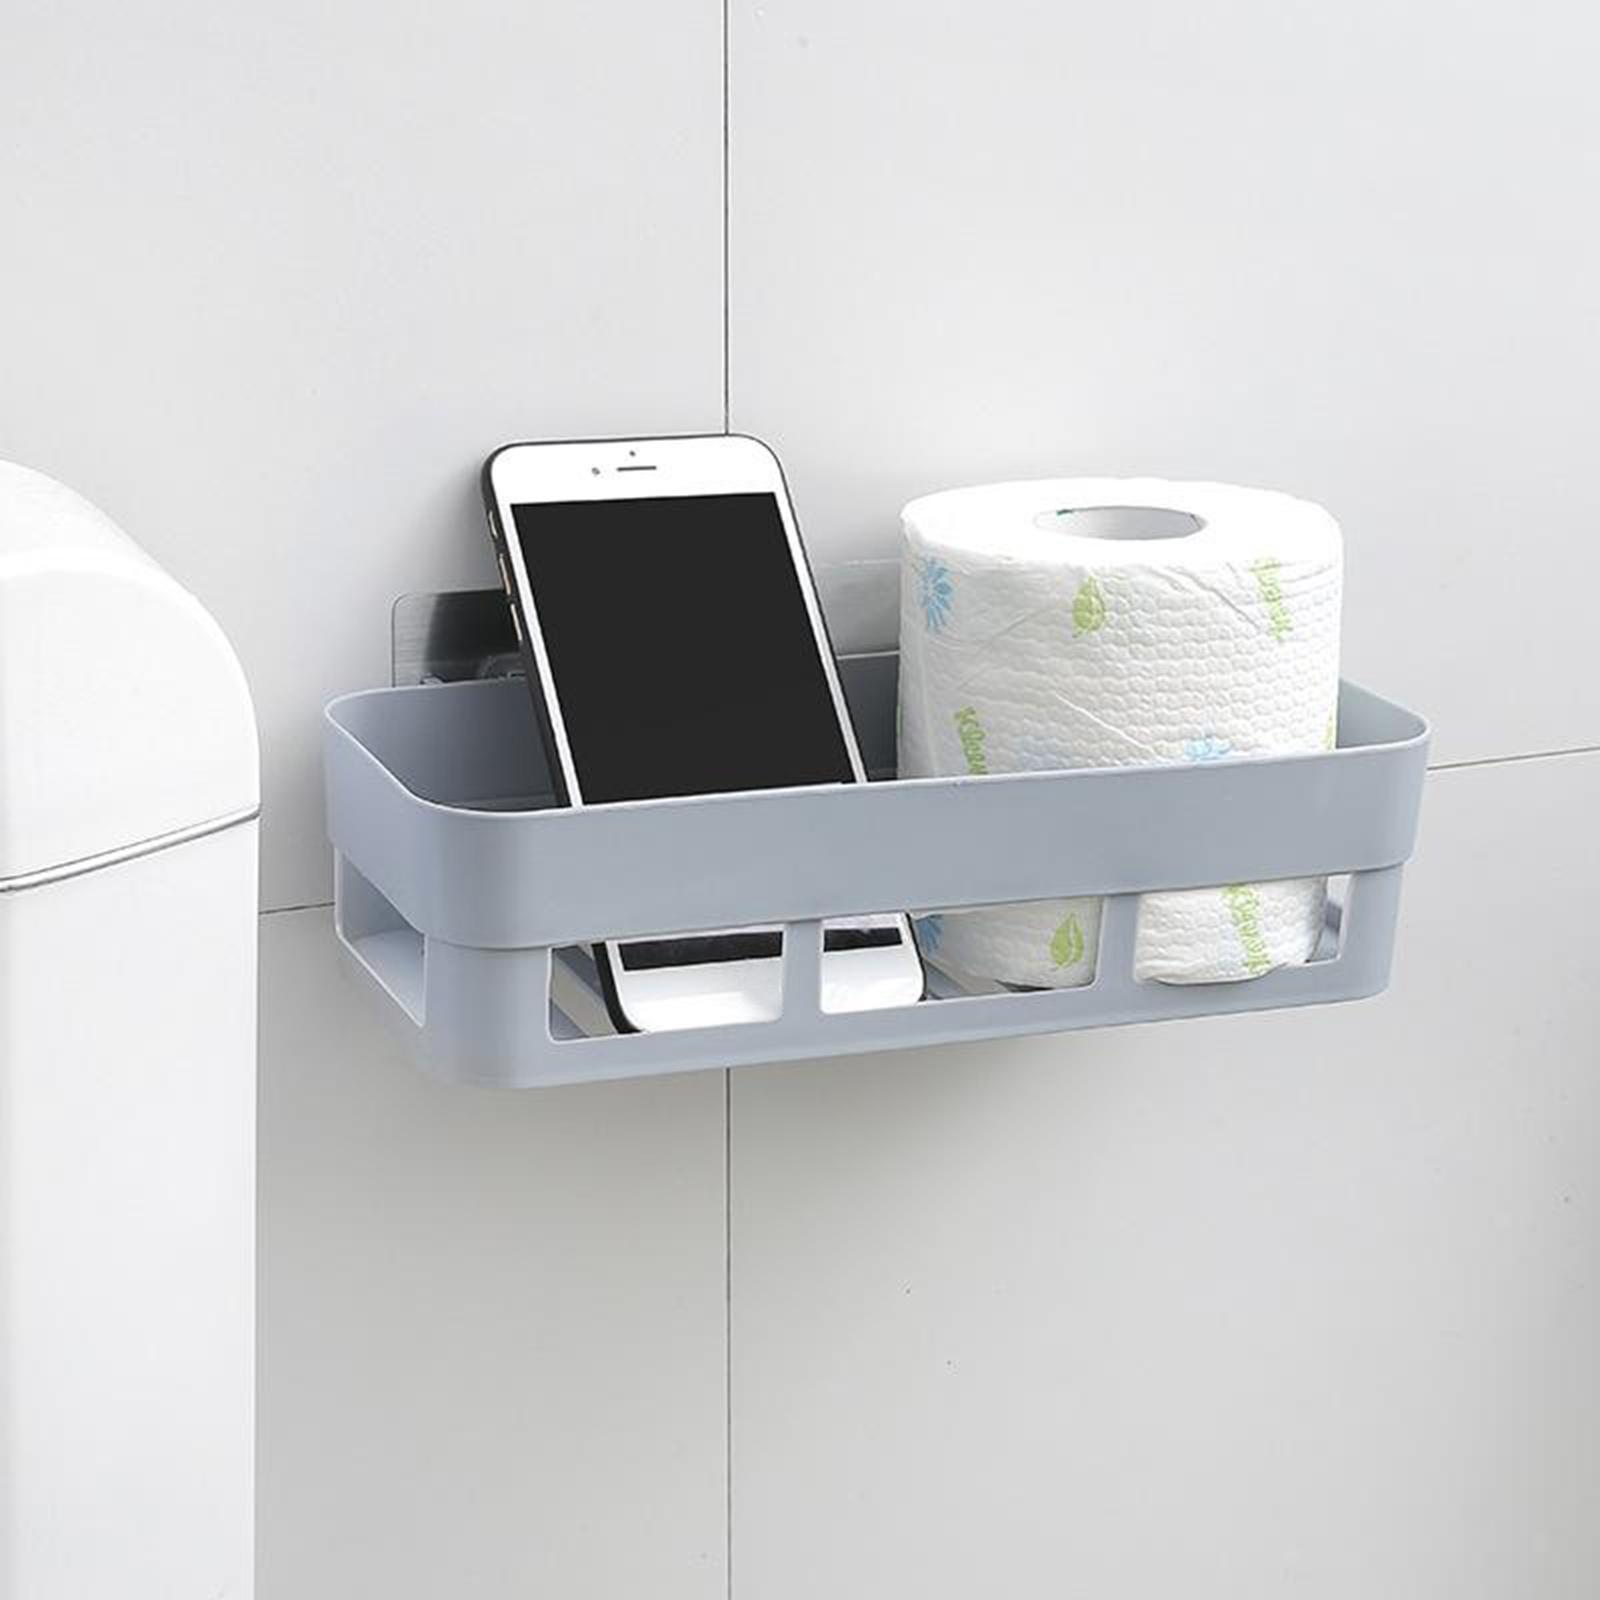 thumbnail 12 - Wall-Suction-Bathroom-Shelf-Shower-Caddy-Wall-Mount-Storage-Rack-Organizer